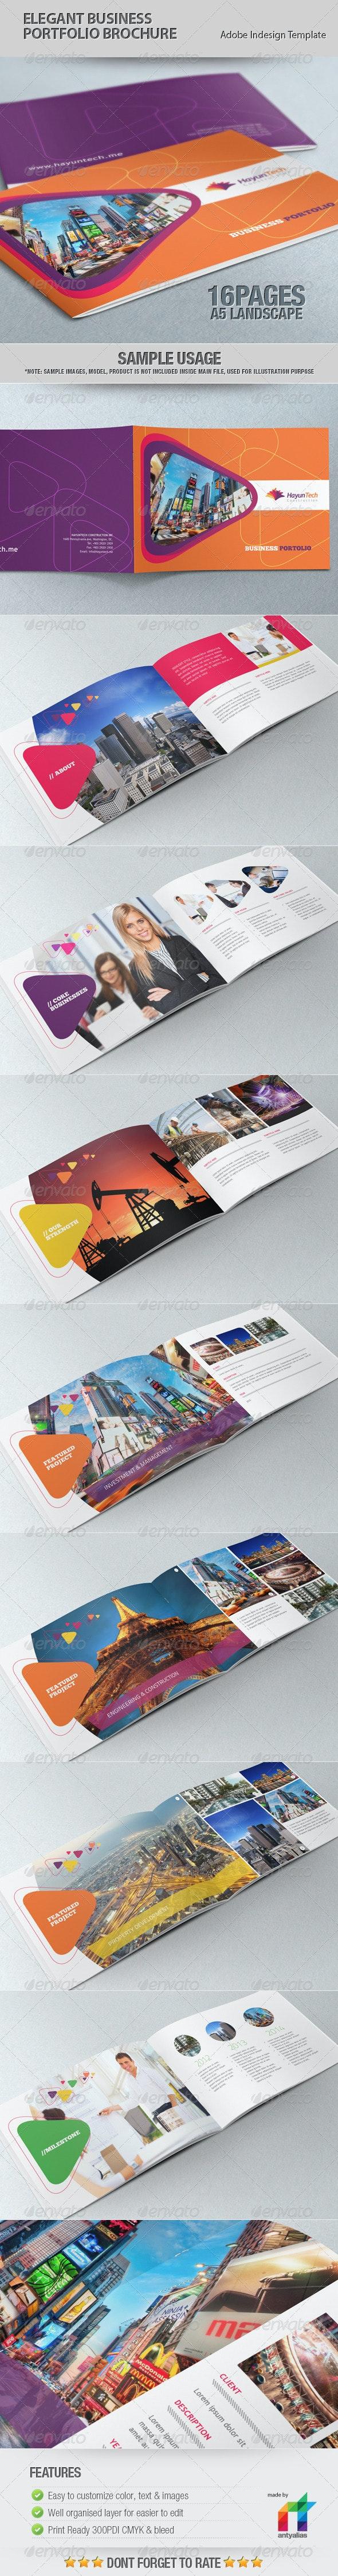 Elegant Business Portfolio Brochure - Portfolio Brochures